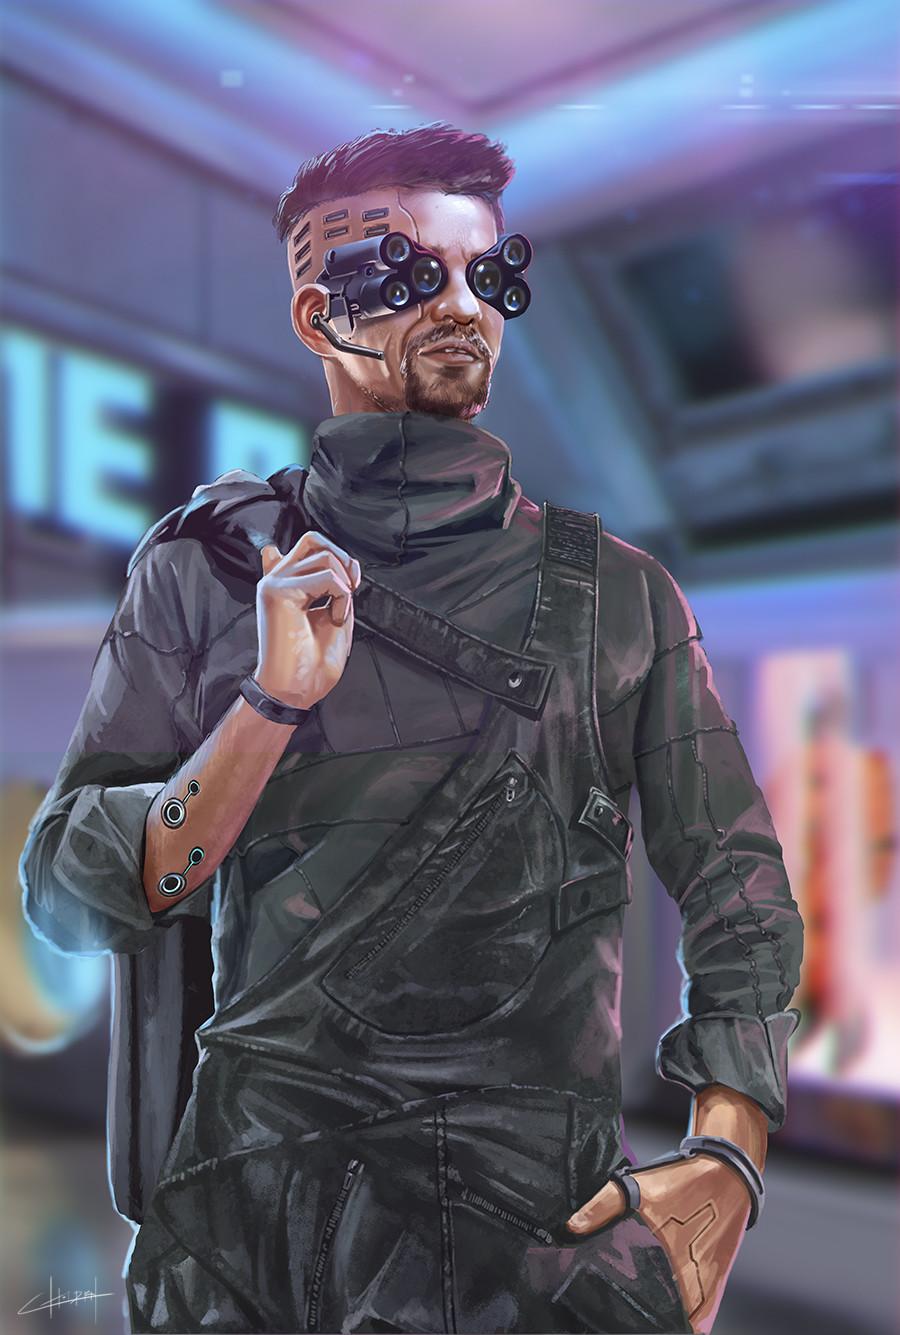 Carl holden 16 agent 01